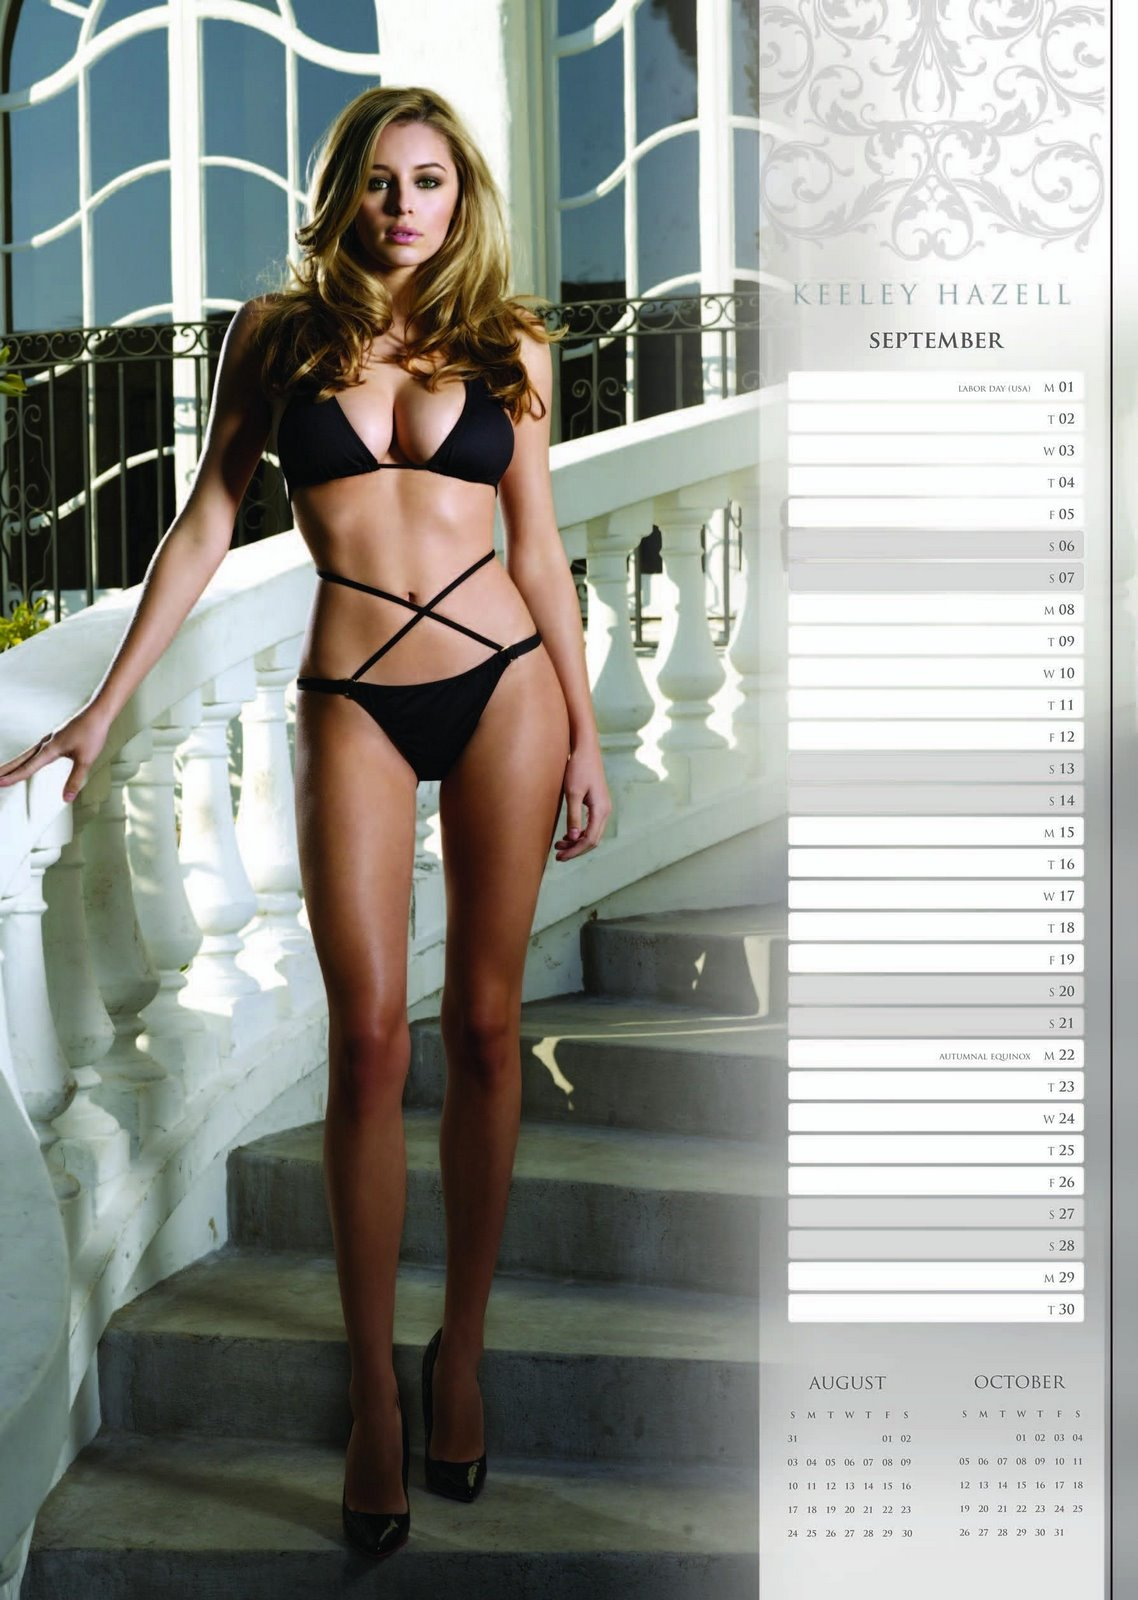 keeley hazell calendar